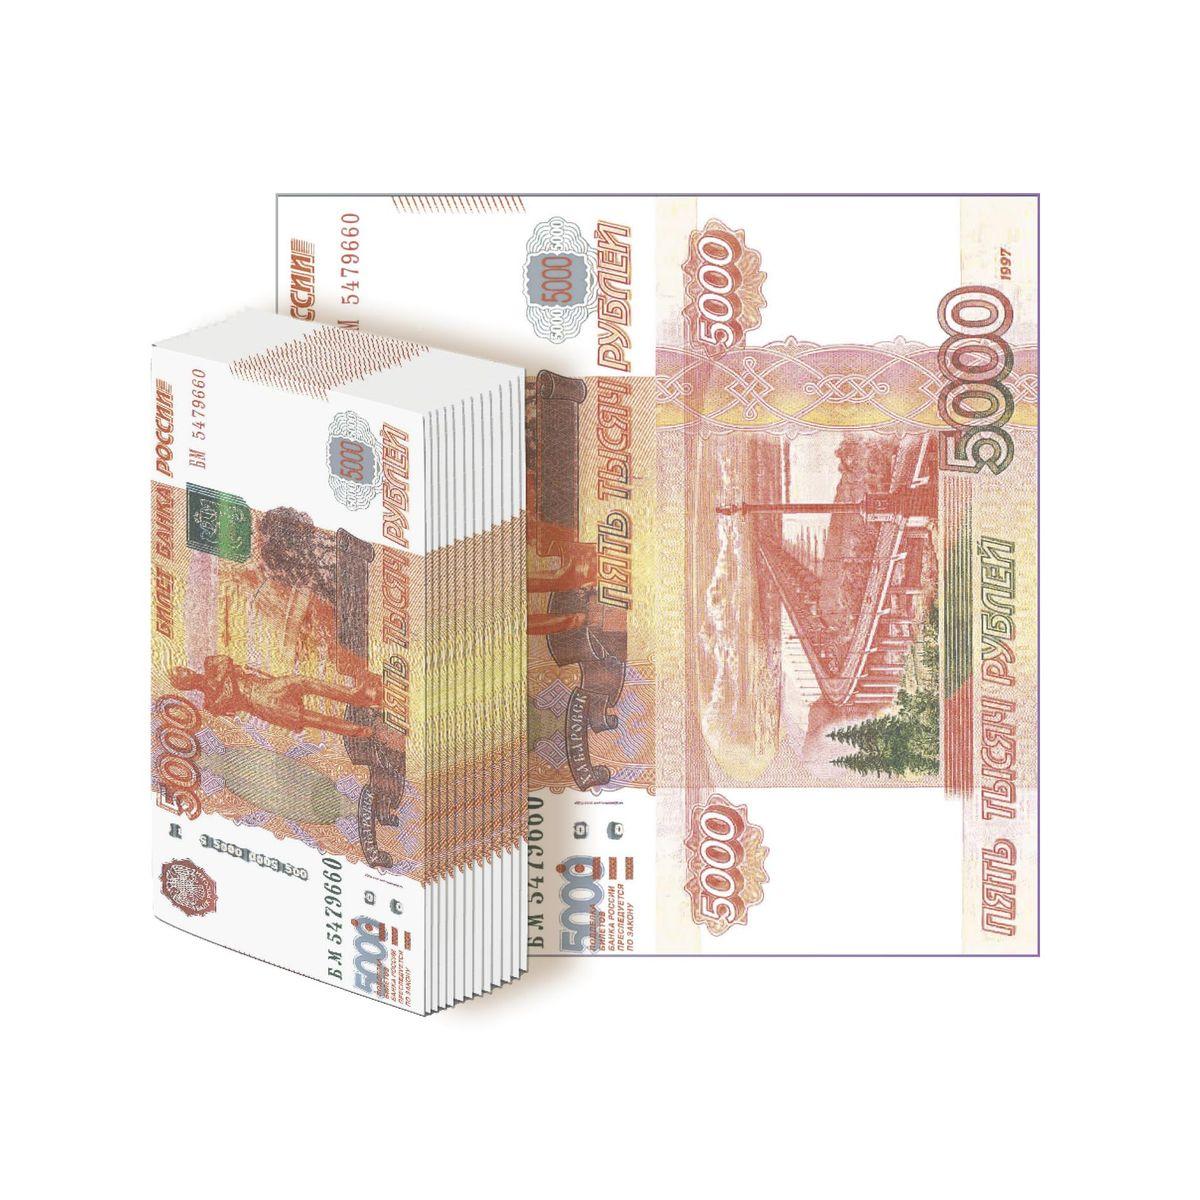 Салфетки бумажные Gratias 5000 рублей, трехслойные, 33 х 33 см, 12 шт бра 22 х 33 х 33